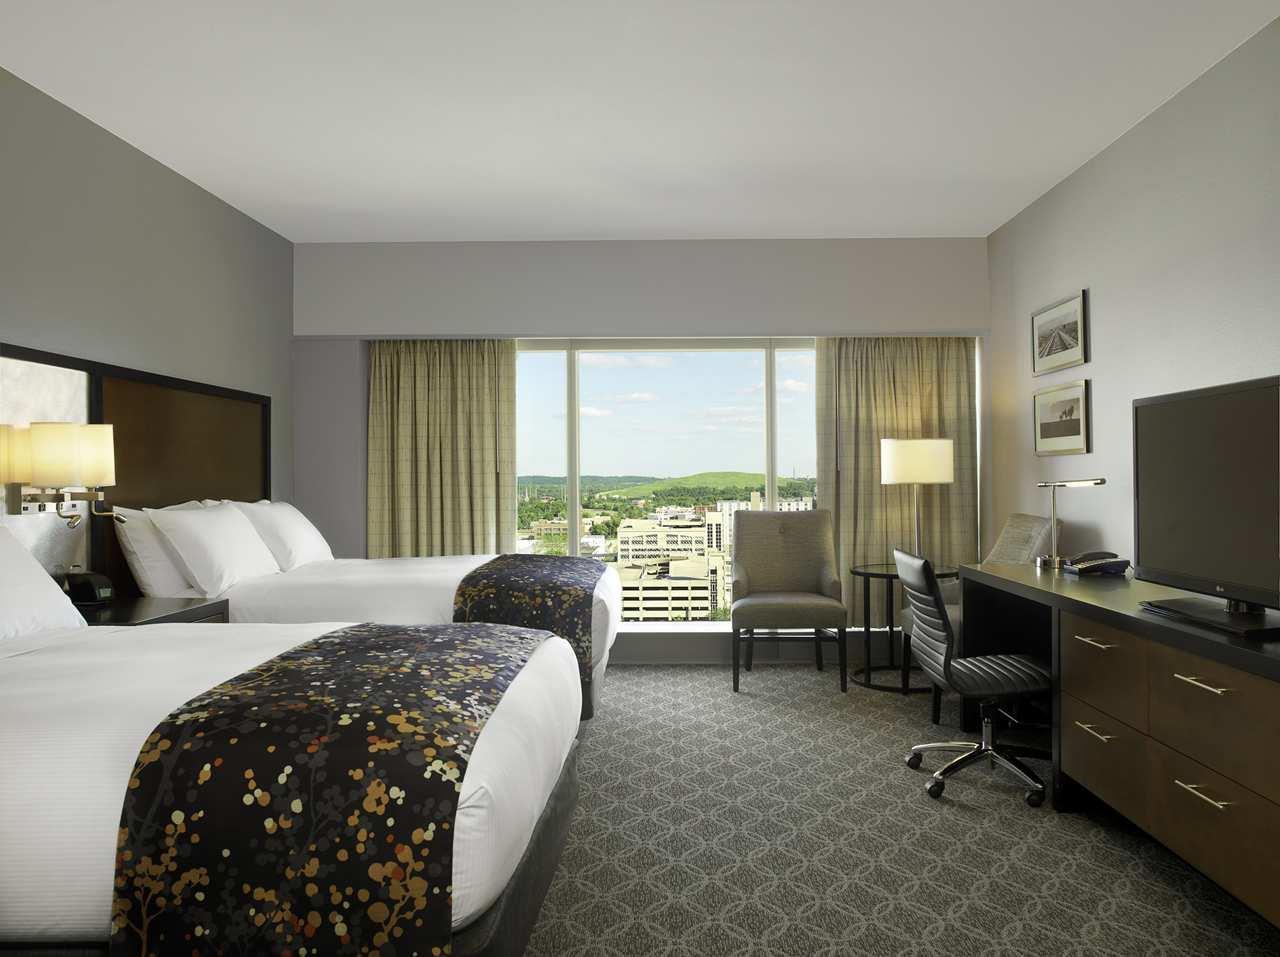 DoubleTree by Hilton Hotel Cedar Rapids Convention Complex image 12